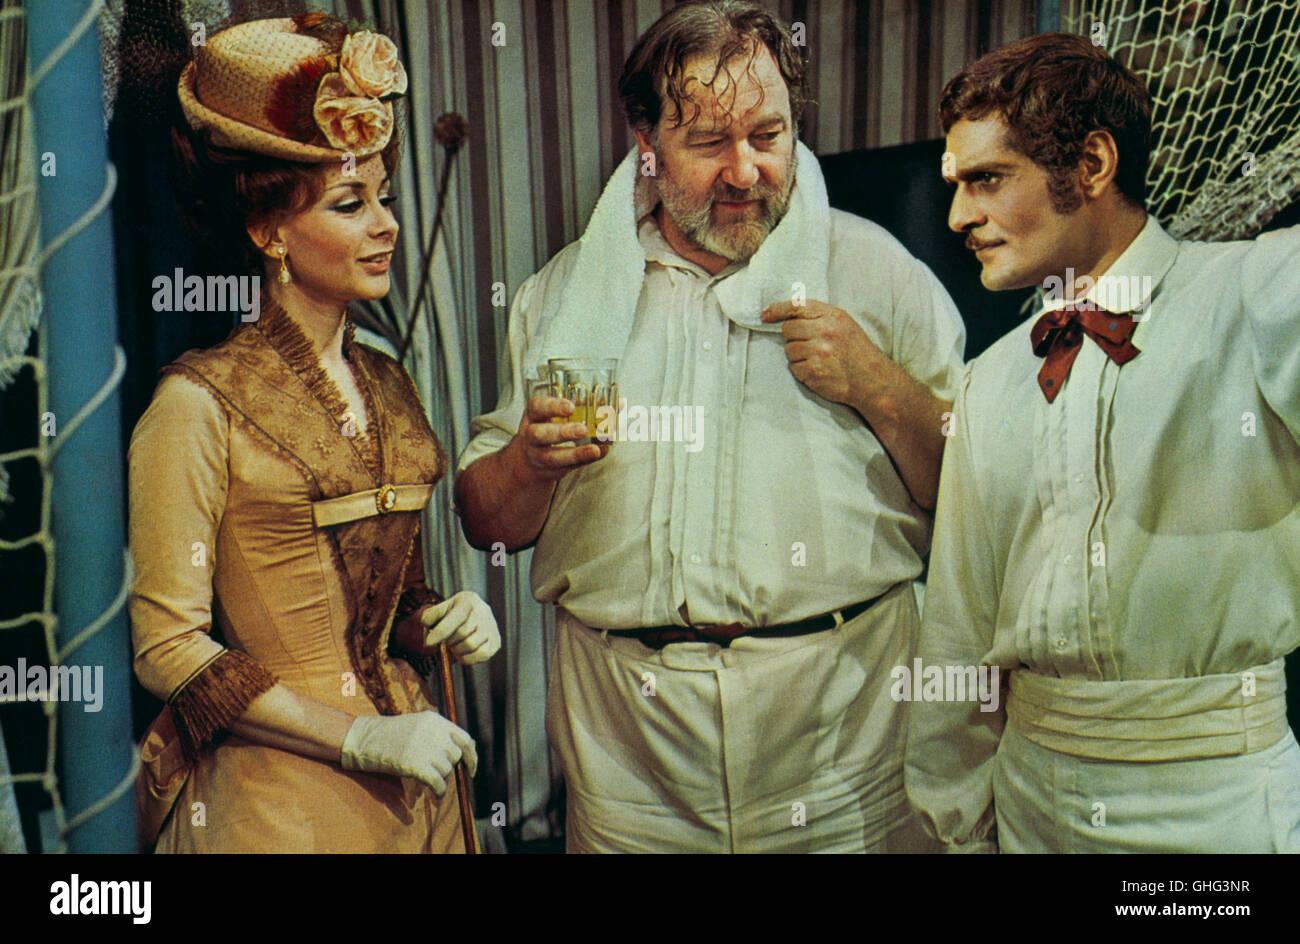 ANDREA PARISY (Princess Stephanie), JAMES ROBERTSON JUSTICE (Edward, Prince of Wales), OMAR SHARIF (Archduke Rudolph) - Stock Image